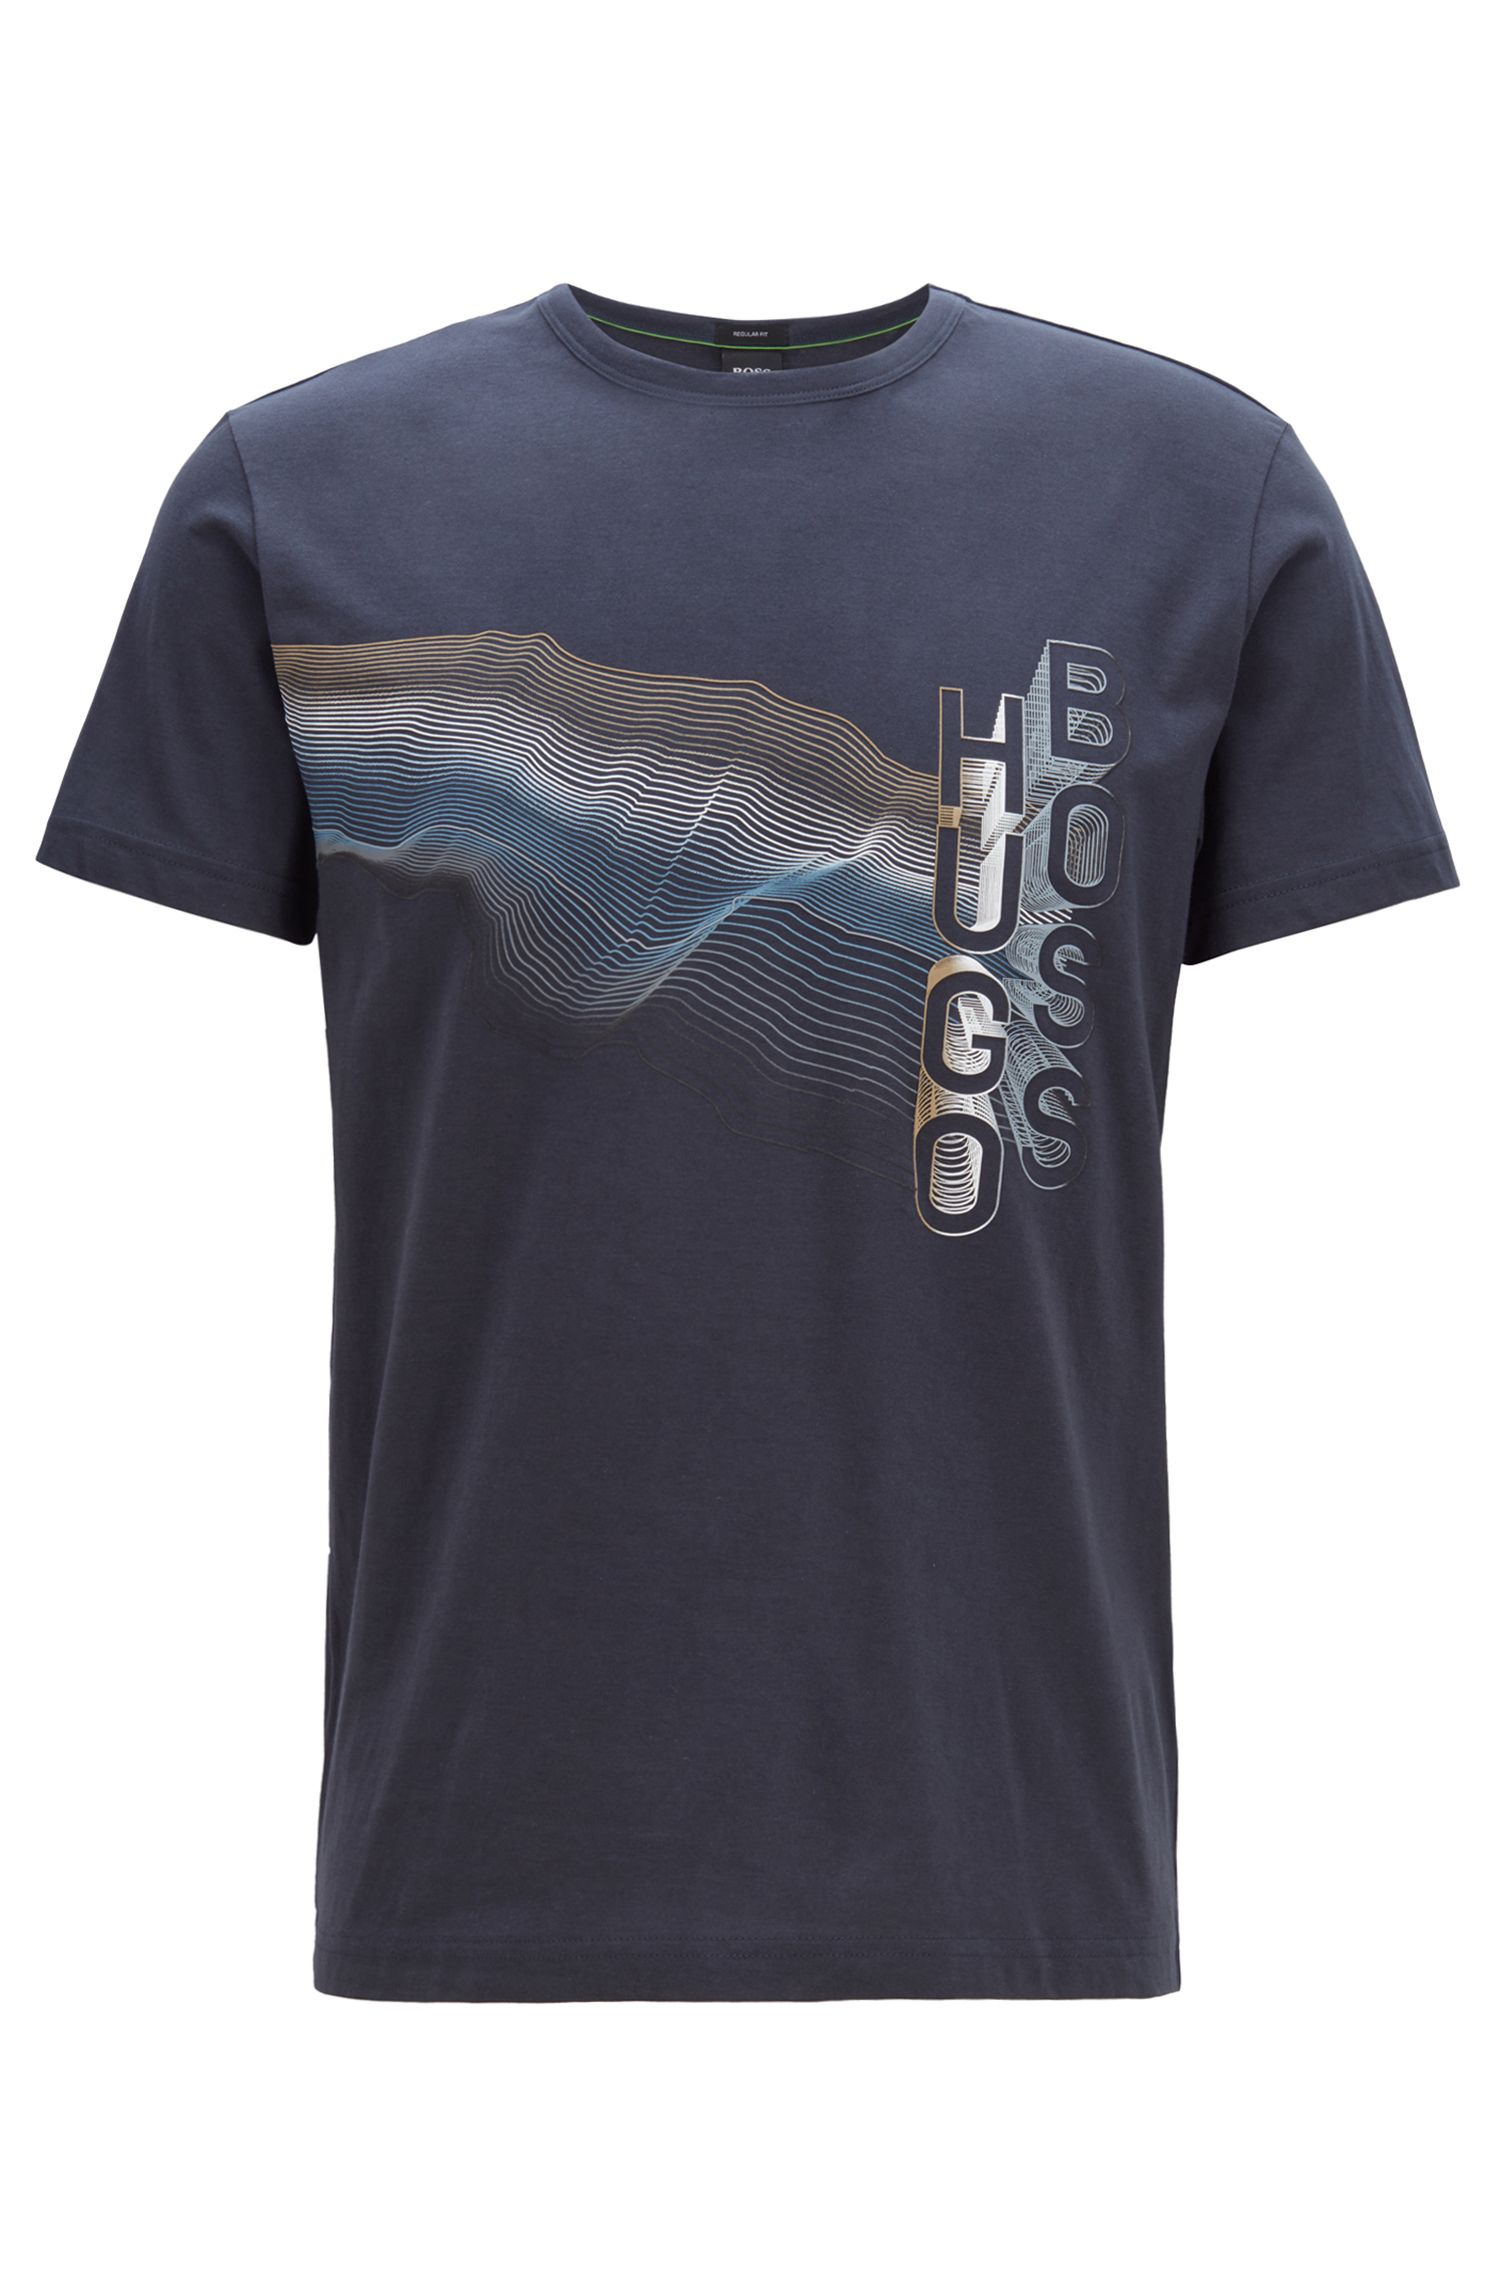 T-Shirt aus Baumwolle mit mehrfarbigem Grafik-Print, Dunkelblau